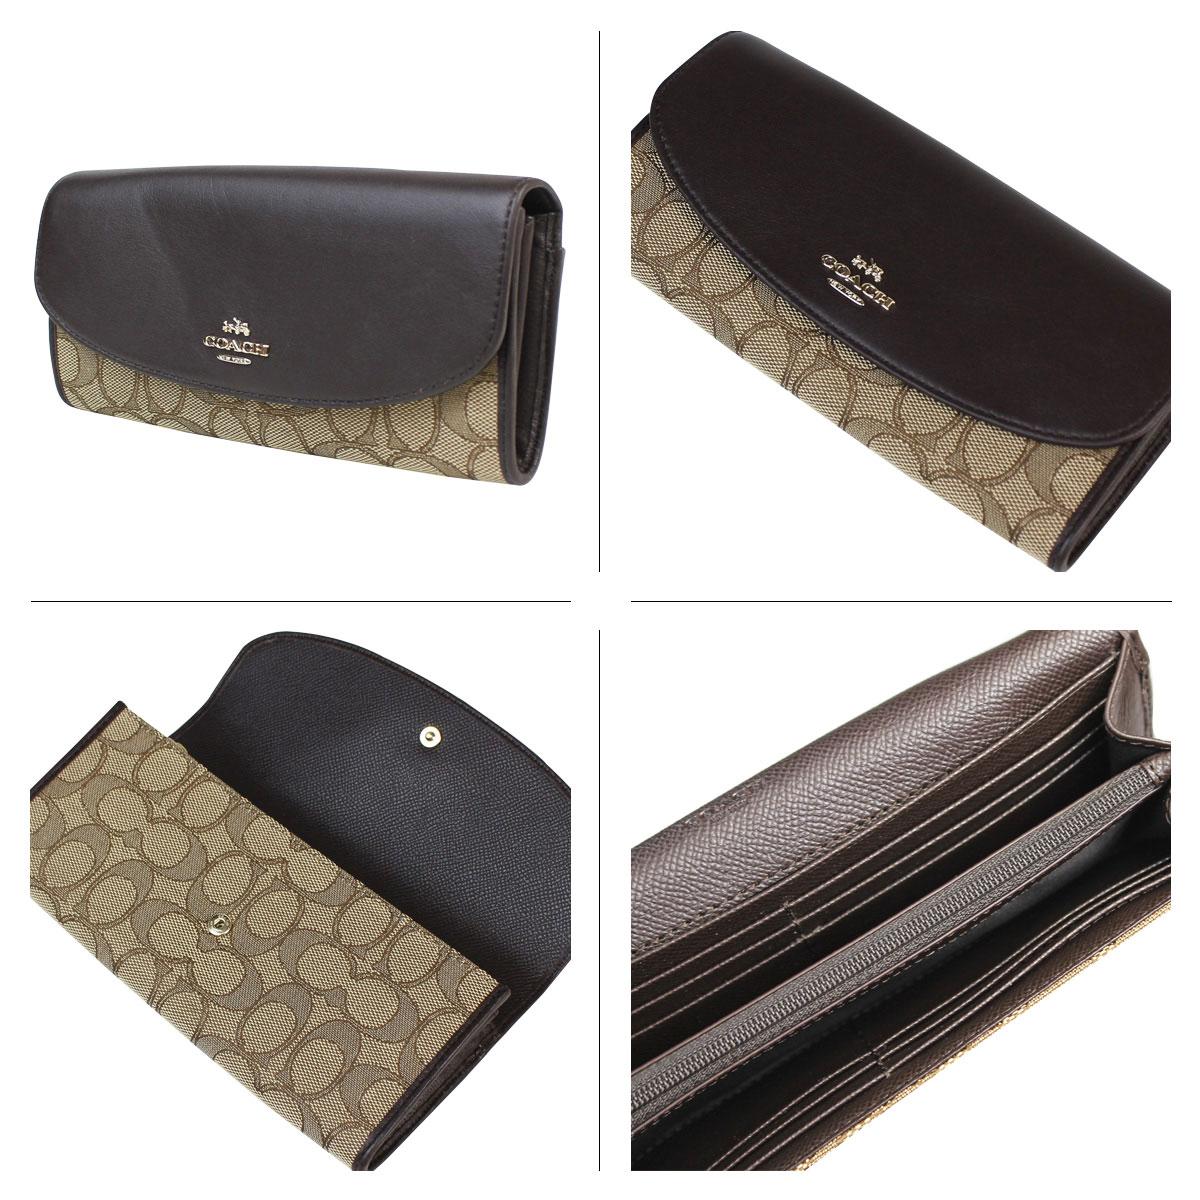 online store eaff8 b0406 COACH 53538 卡其/棕色織布&皮革長夾--售出@ usa4umall 的美國 ...